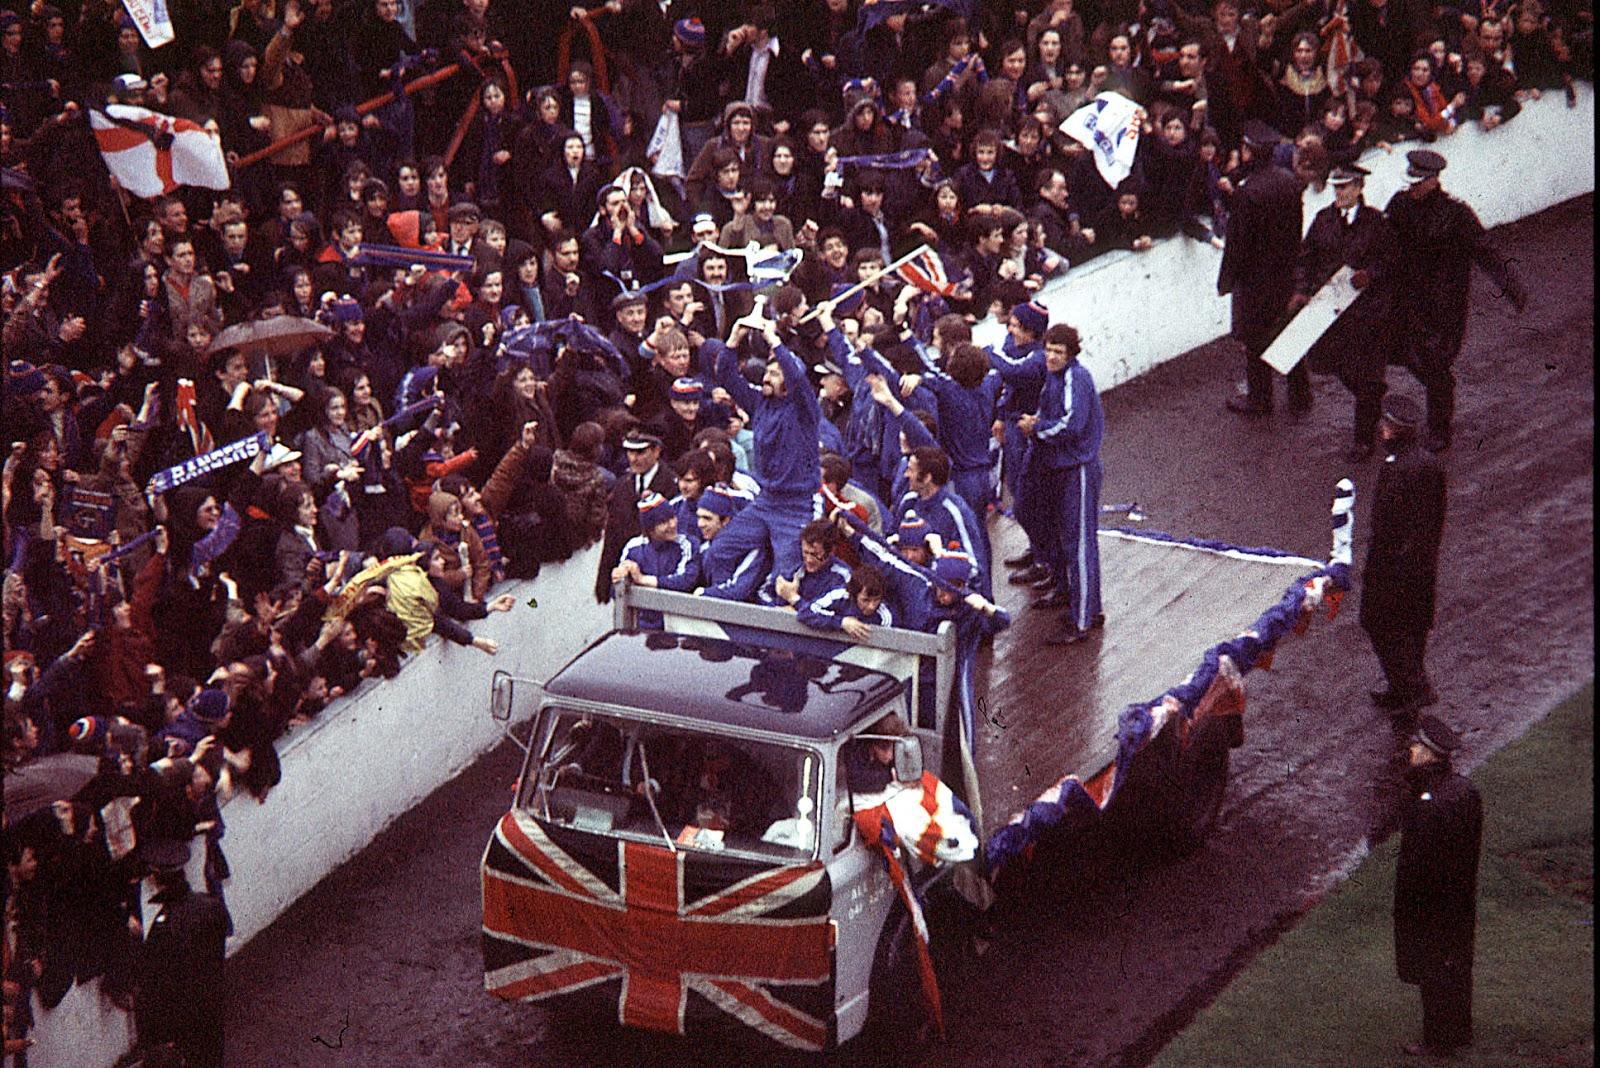 Soccer, football or whatever: Glasgow Rangers Greatest All-Time Team